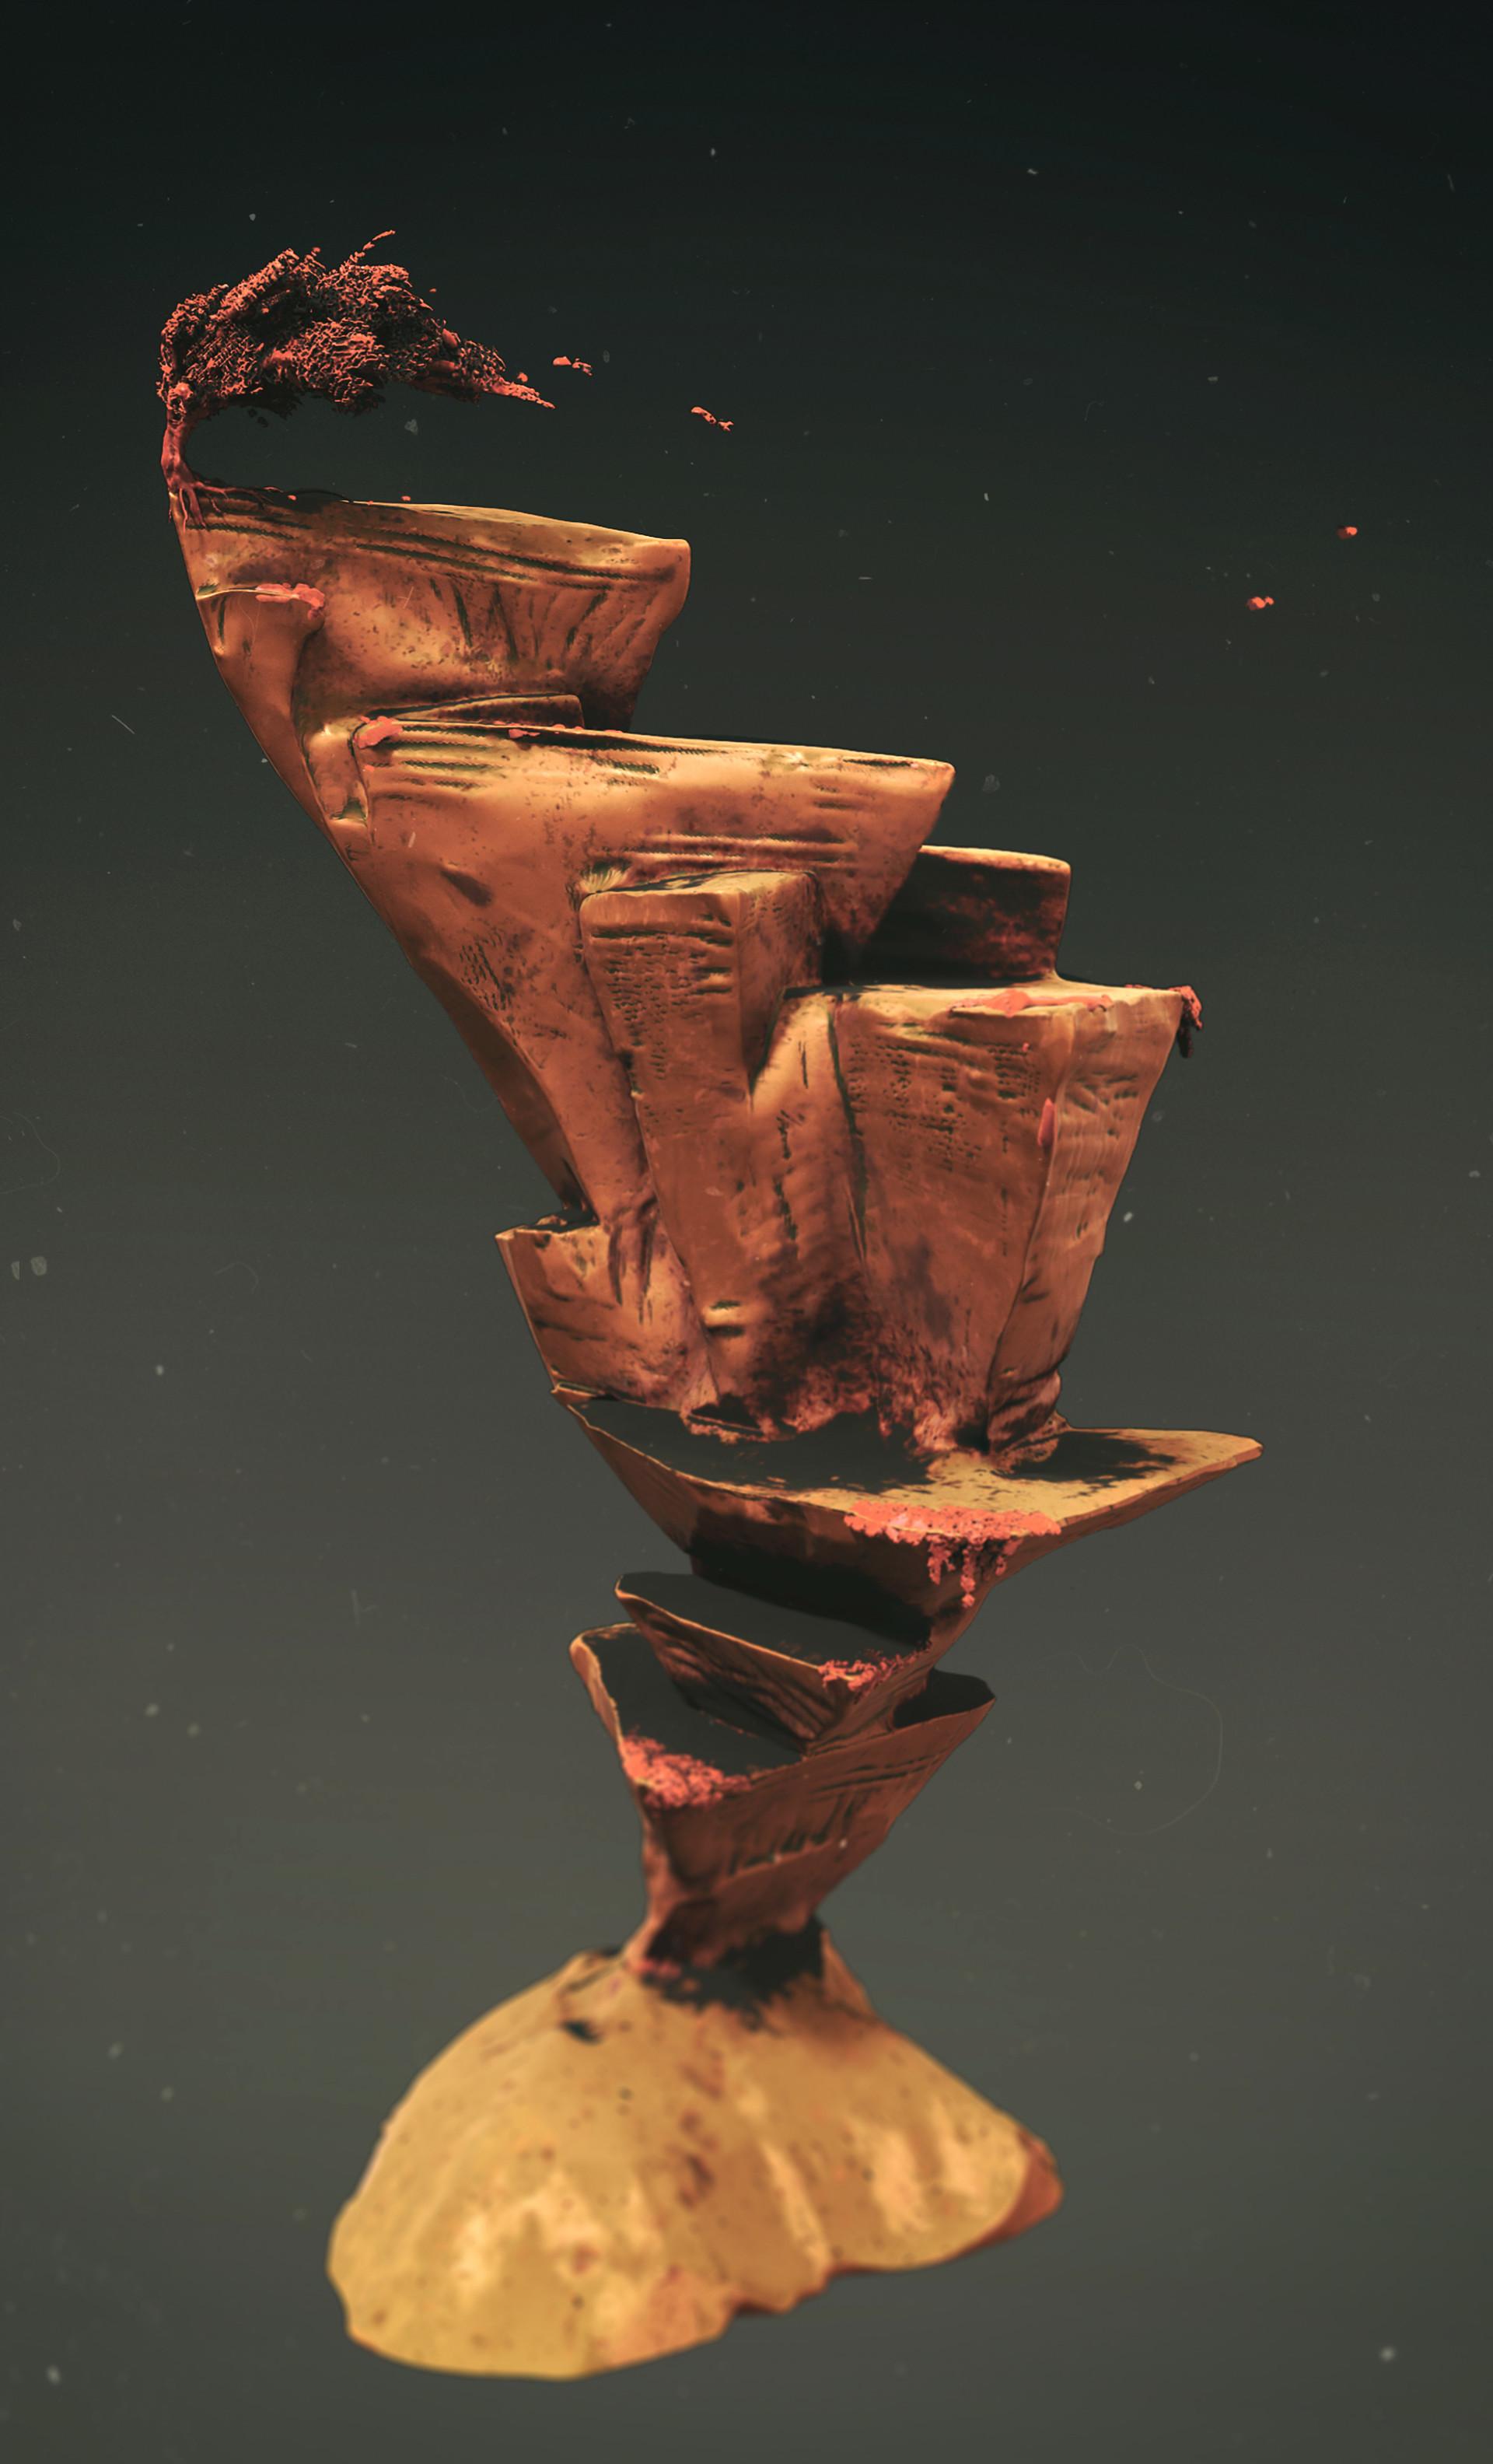 arash-razavi-5